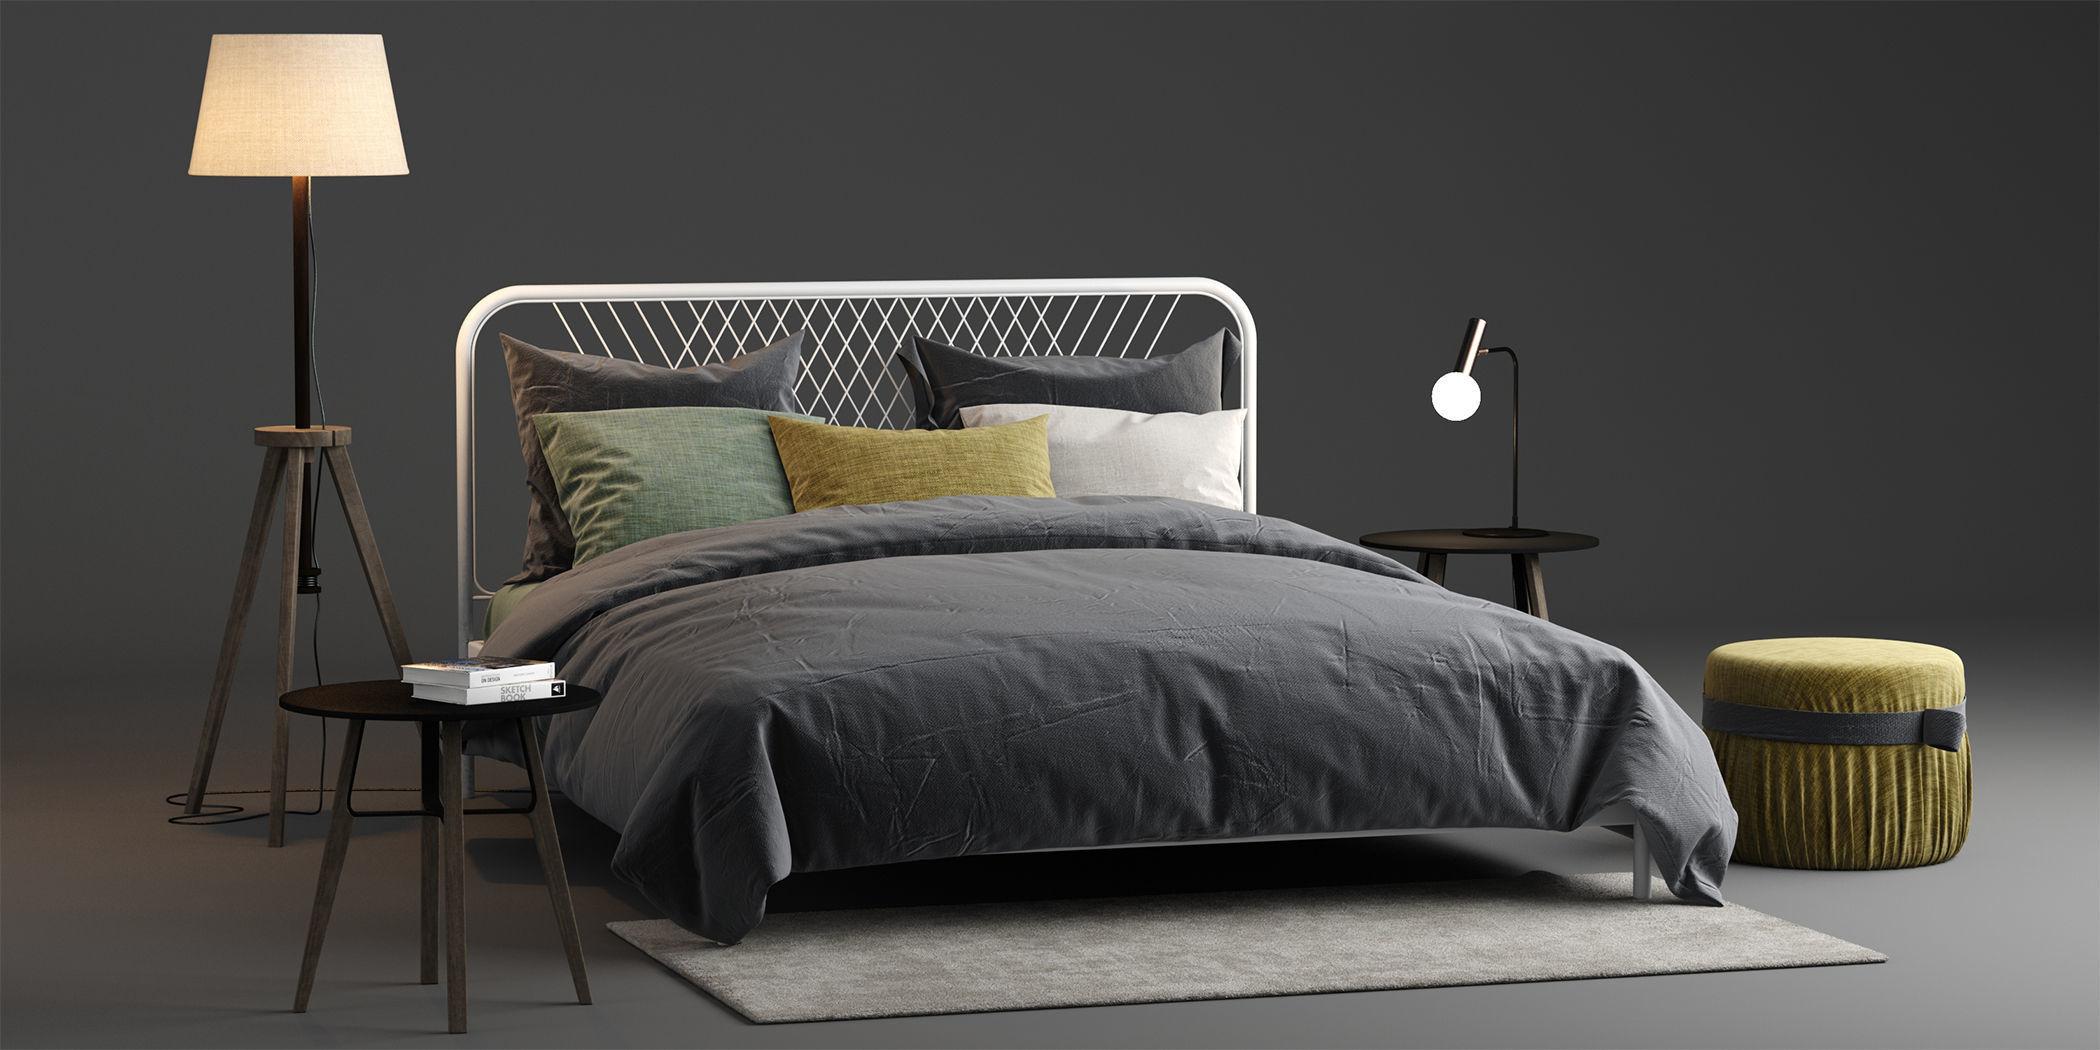 Ikea Nesttun